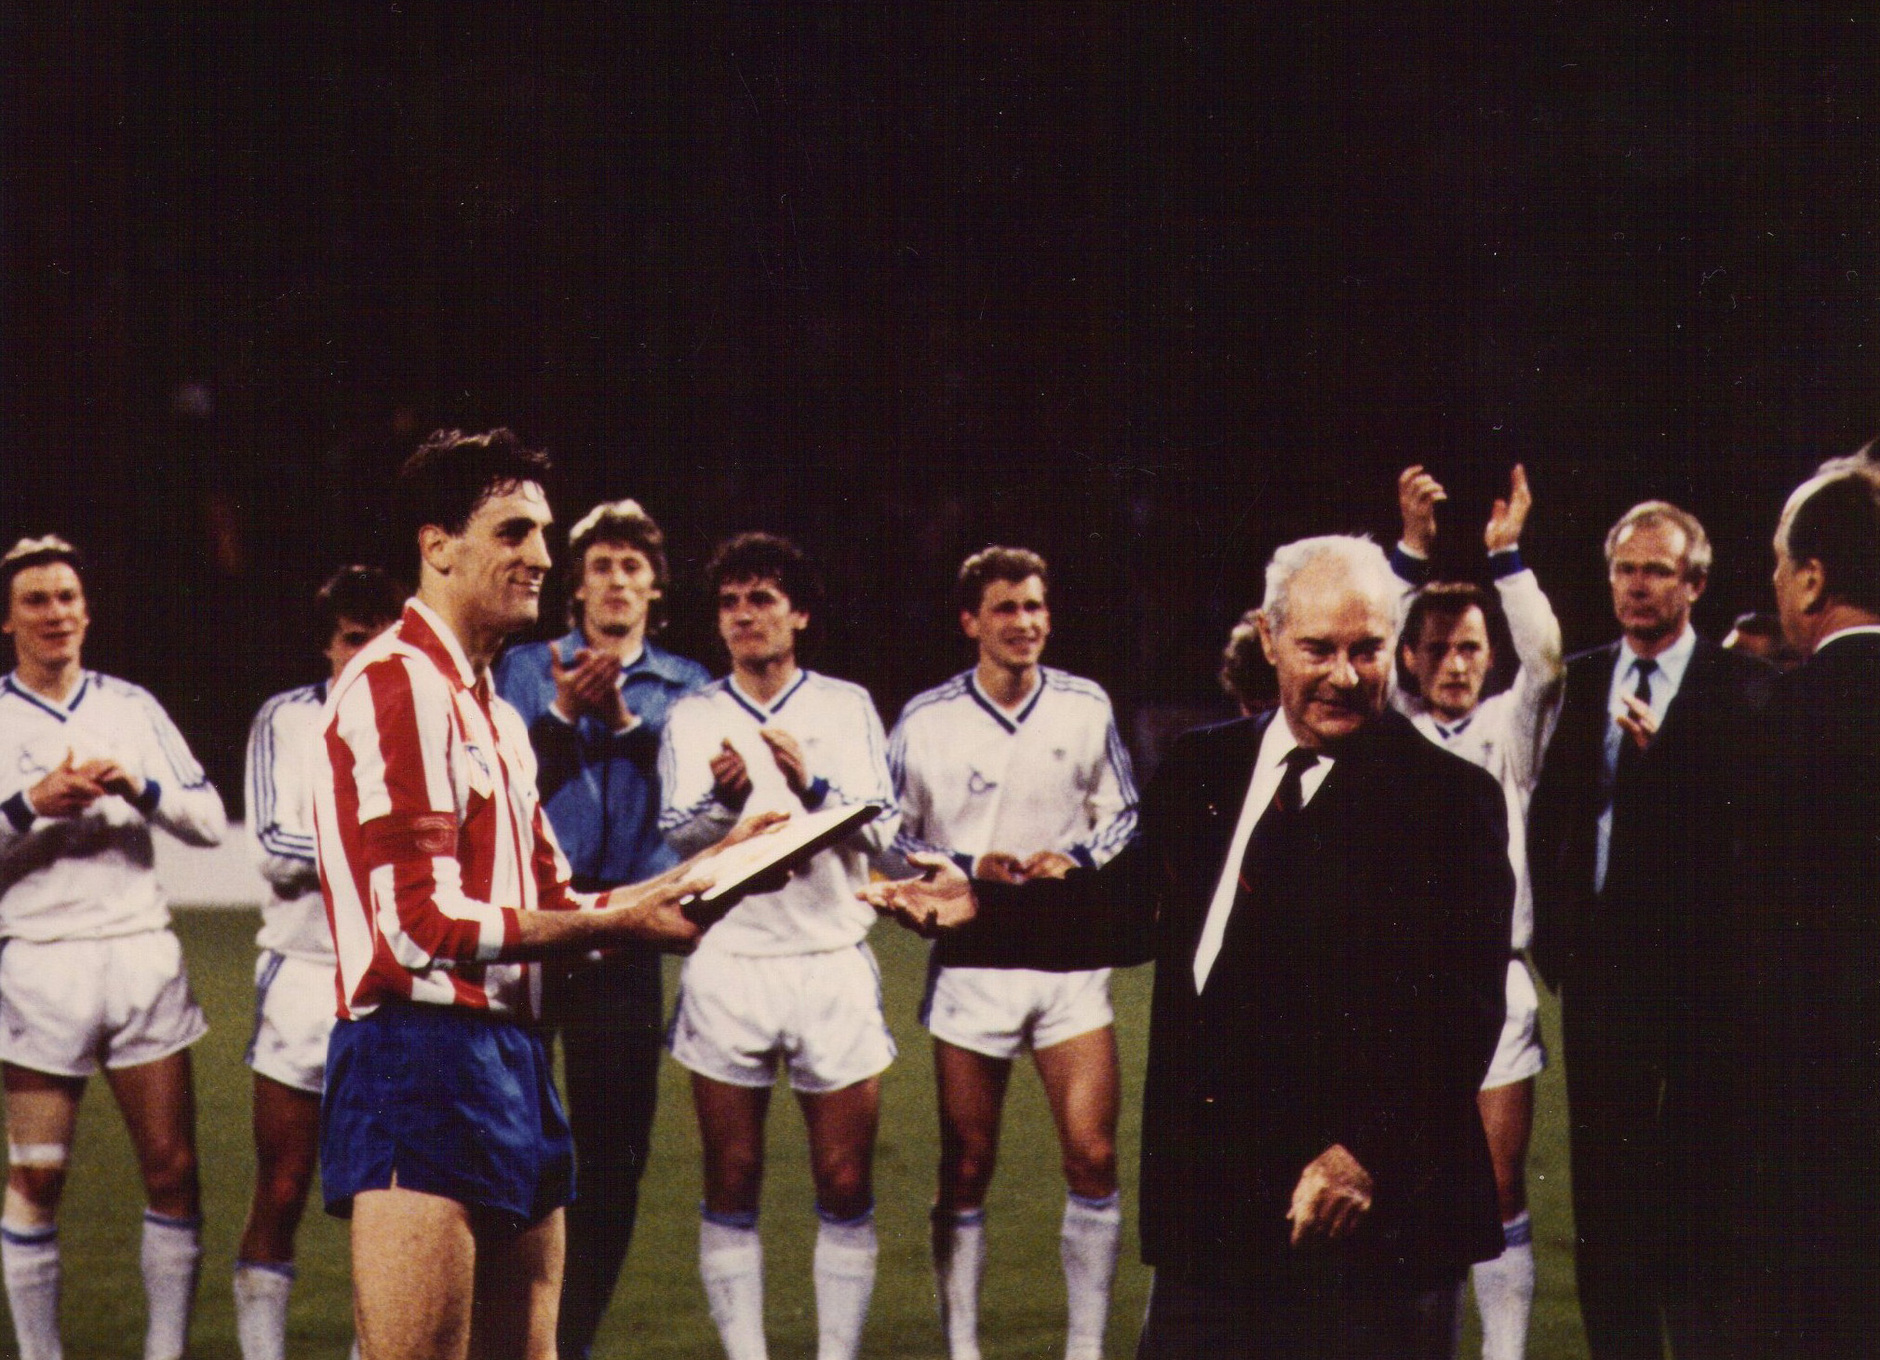 Miguel Ángel Ruiz (1977-1987) FOTO10